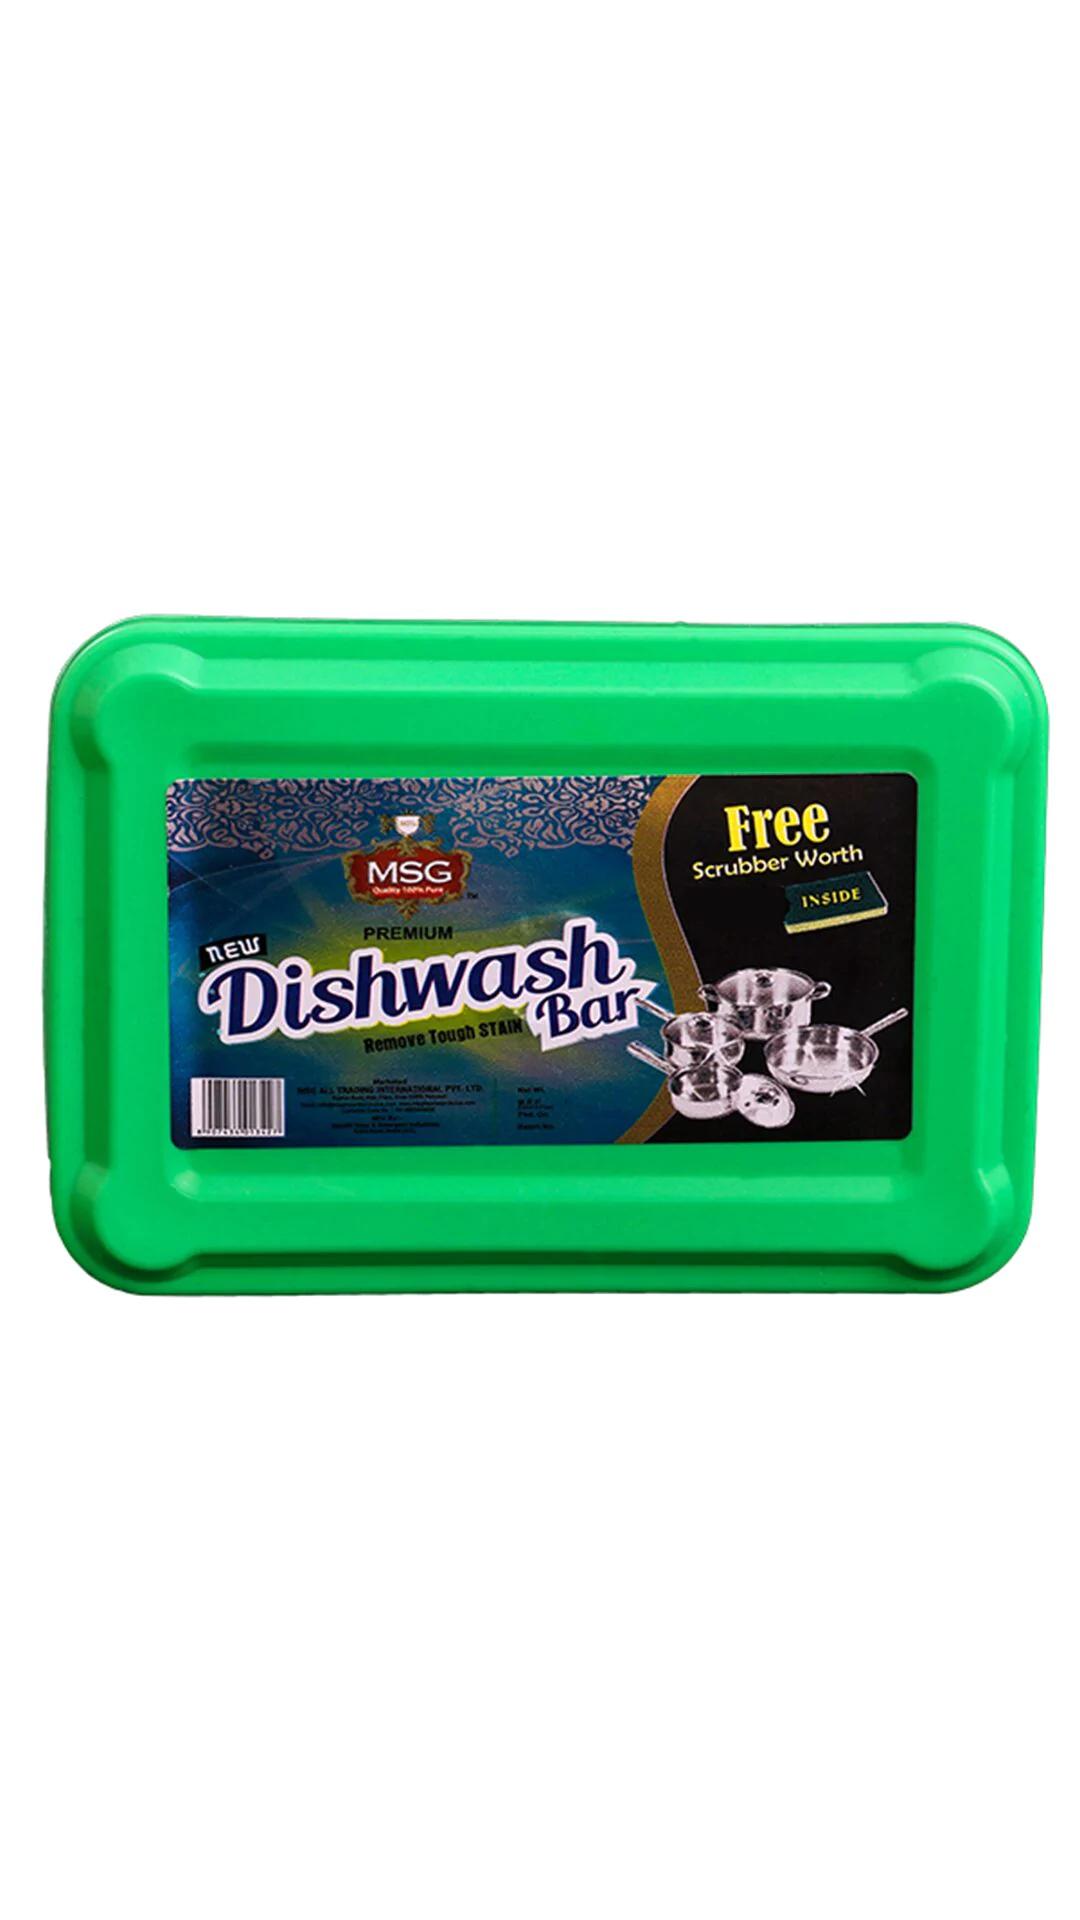 MSG Diswash Bar